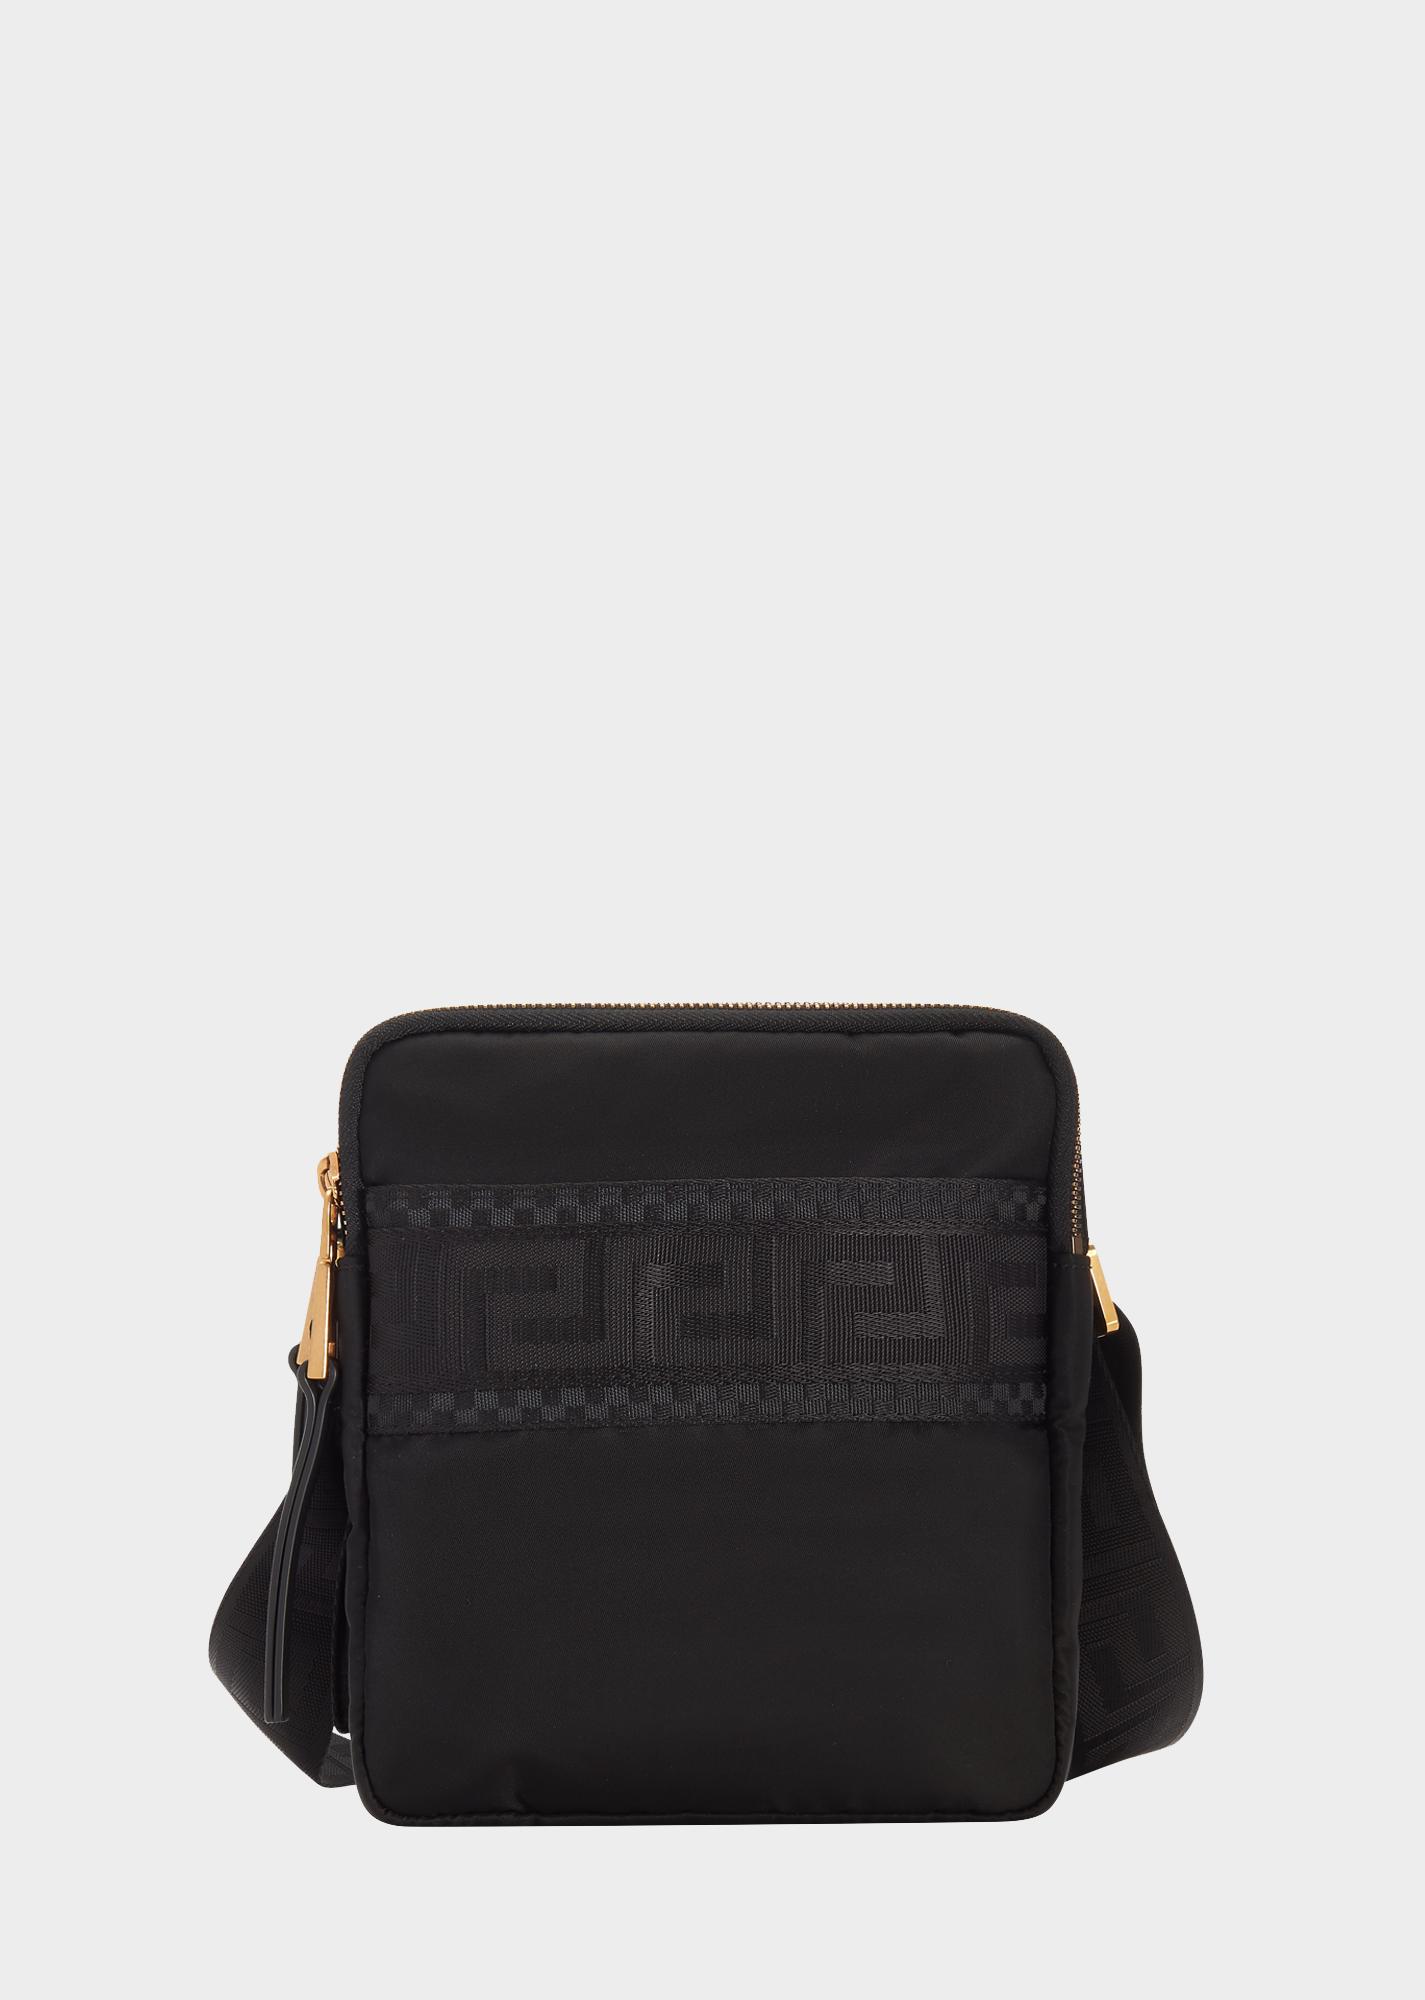 17f8462da3 VERSACE Greca Ribbon Cross Body Bag.  versace  bags  shoulder bags  leather   nylon  lining